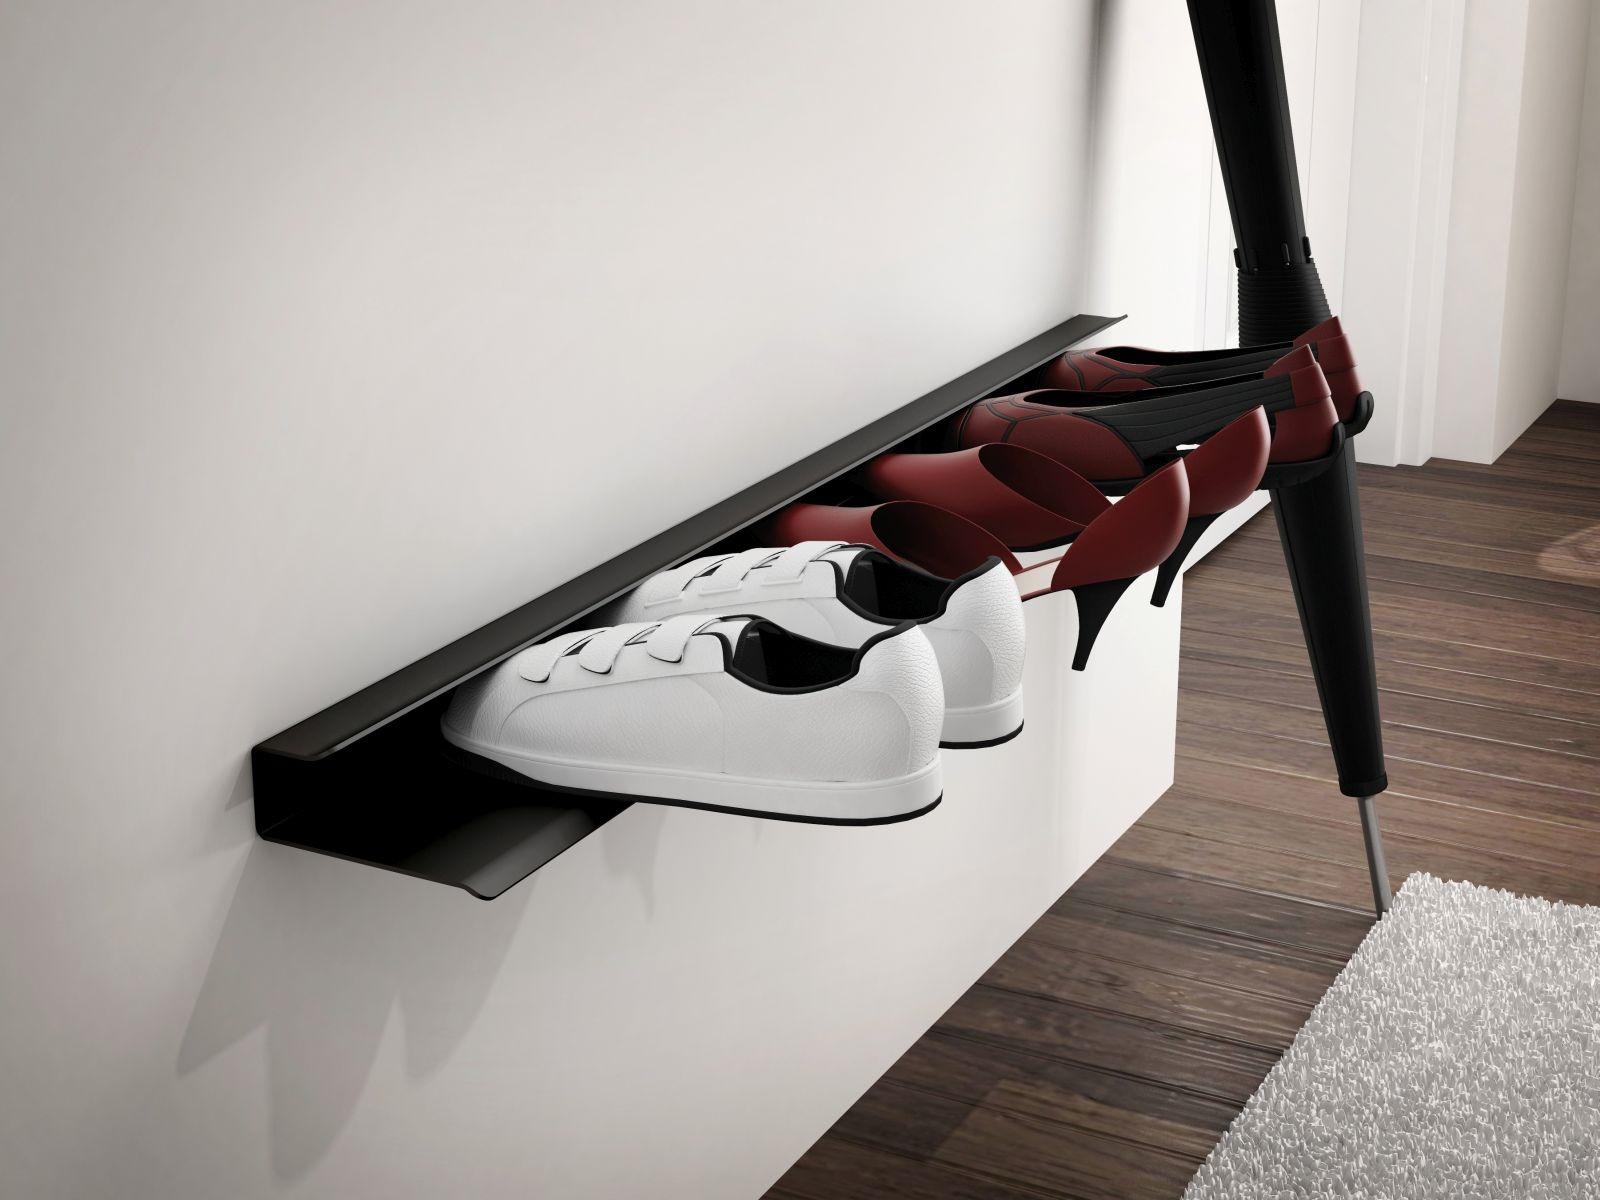 Nástěnná police na boty Sko, 85 cm, černá